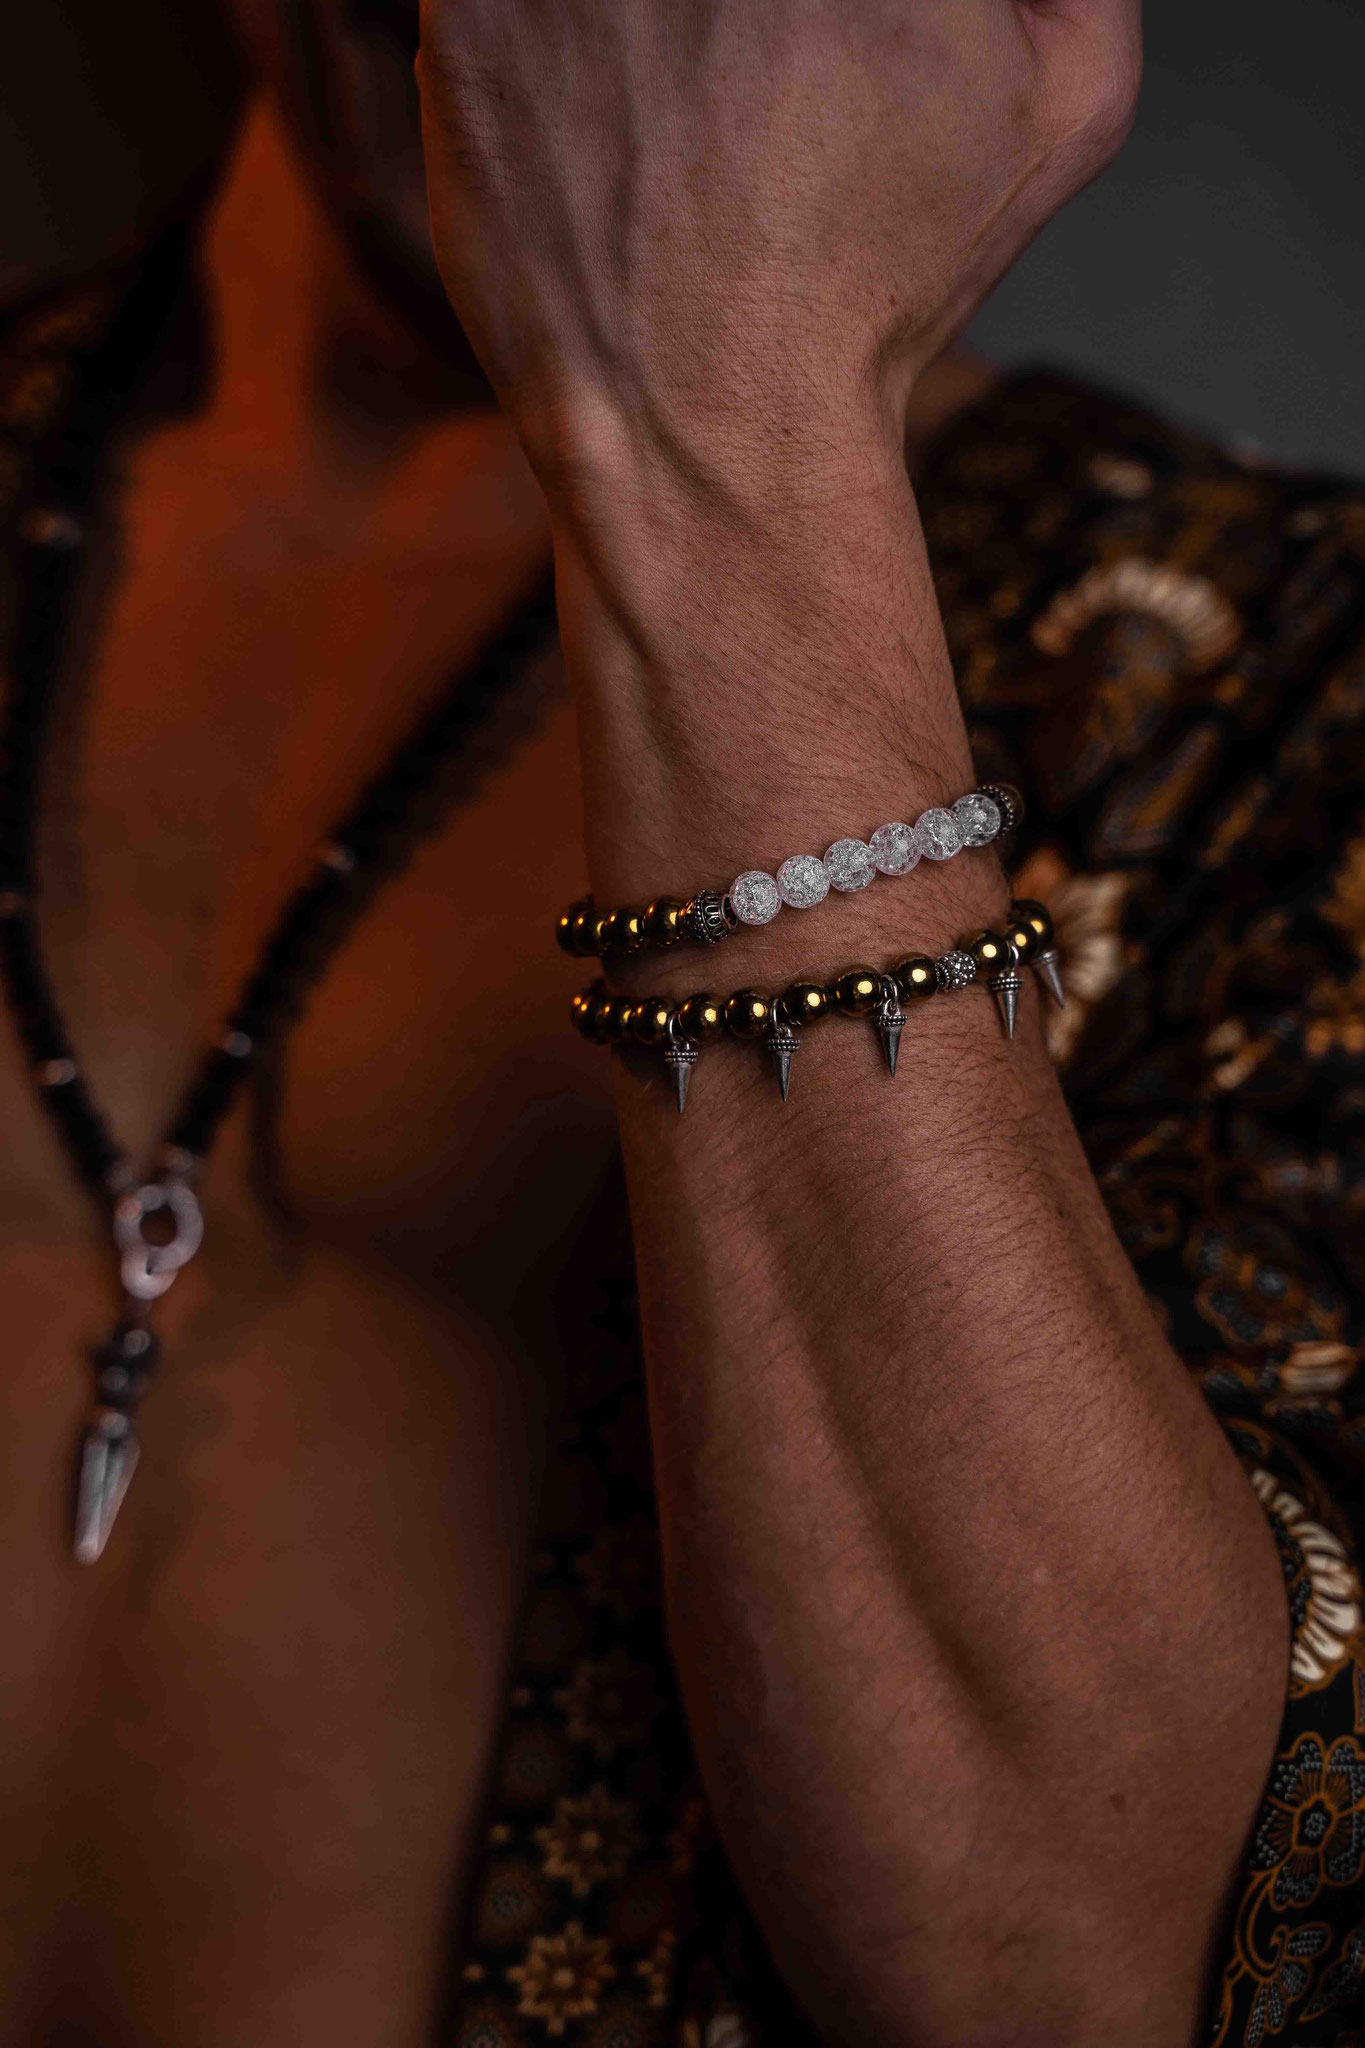 BEHERO Herren - Armband Comet & Rose aus goldenem Hämatit